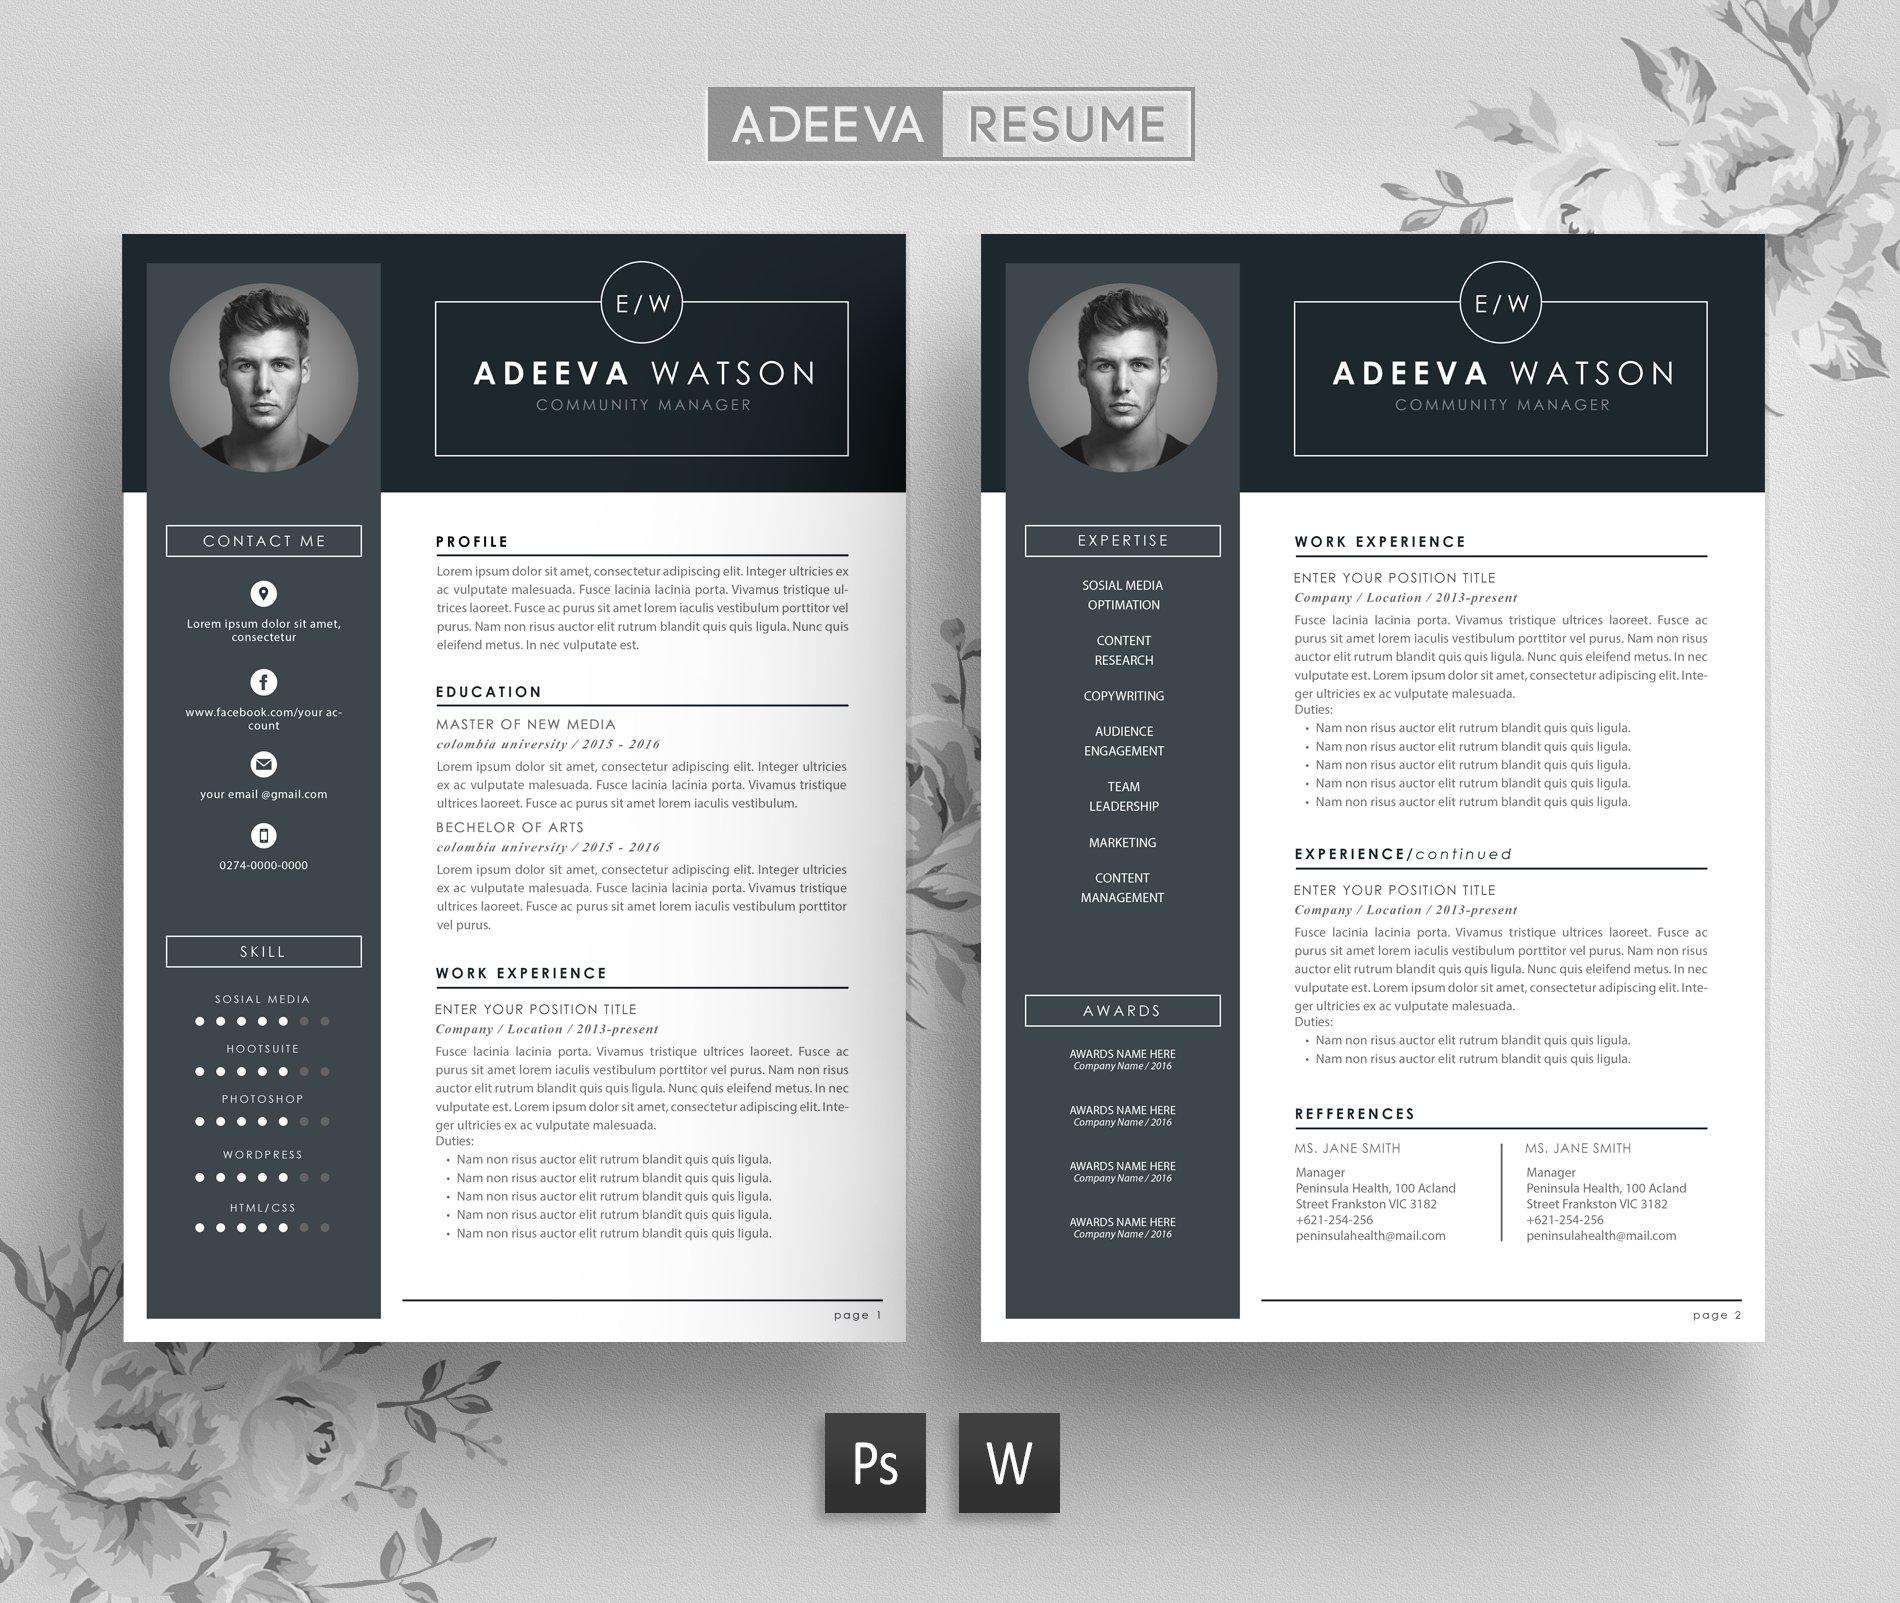 Creative Resume Design Examples: Professional Resume Template Watson